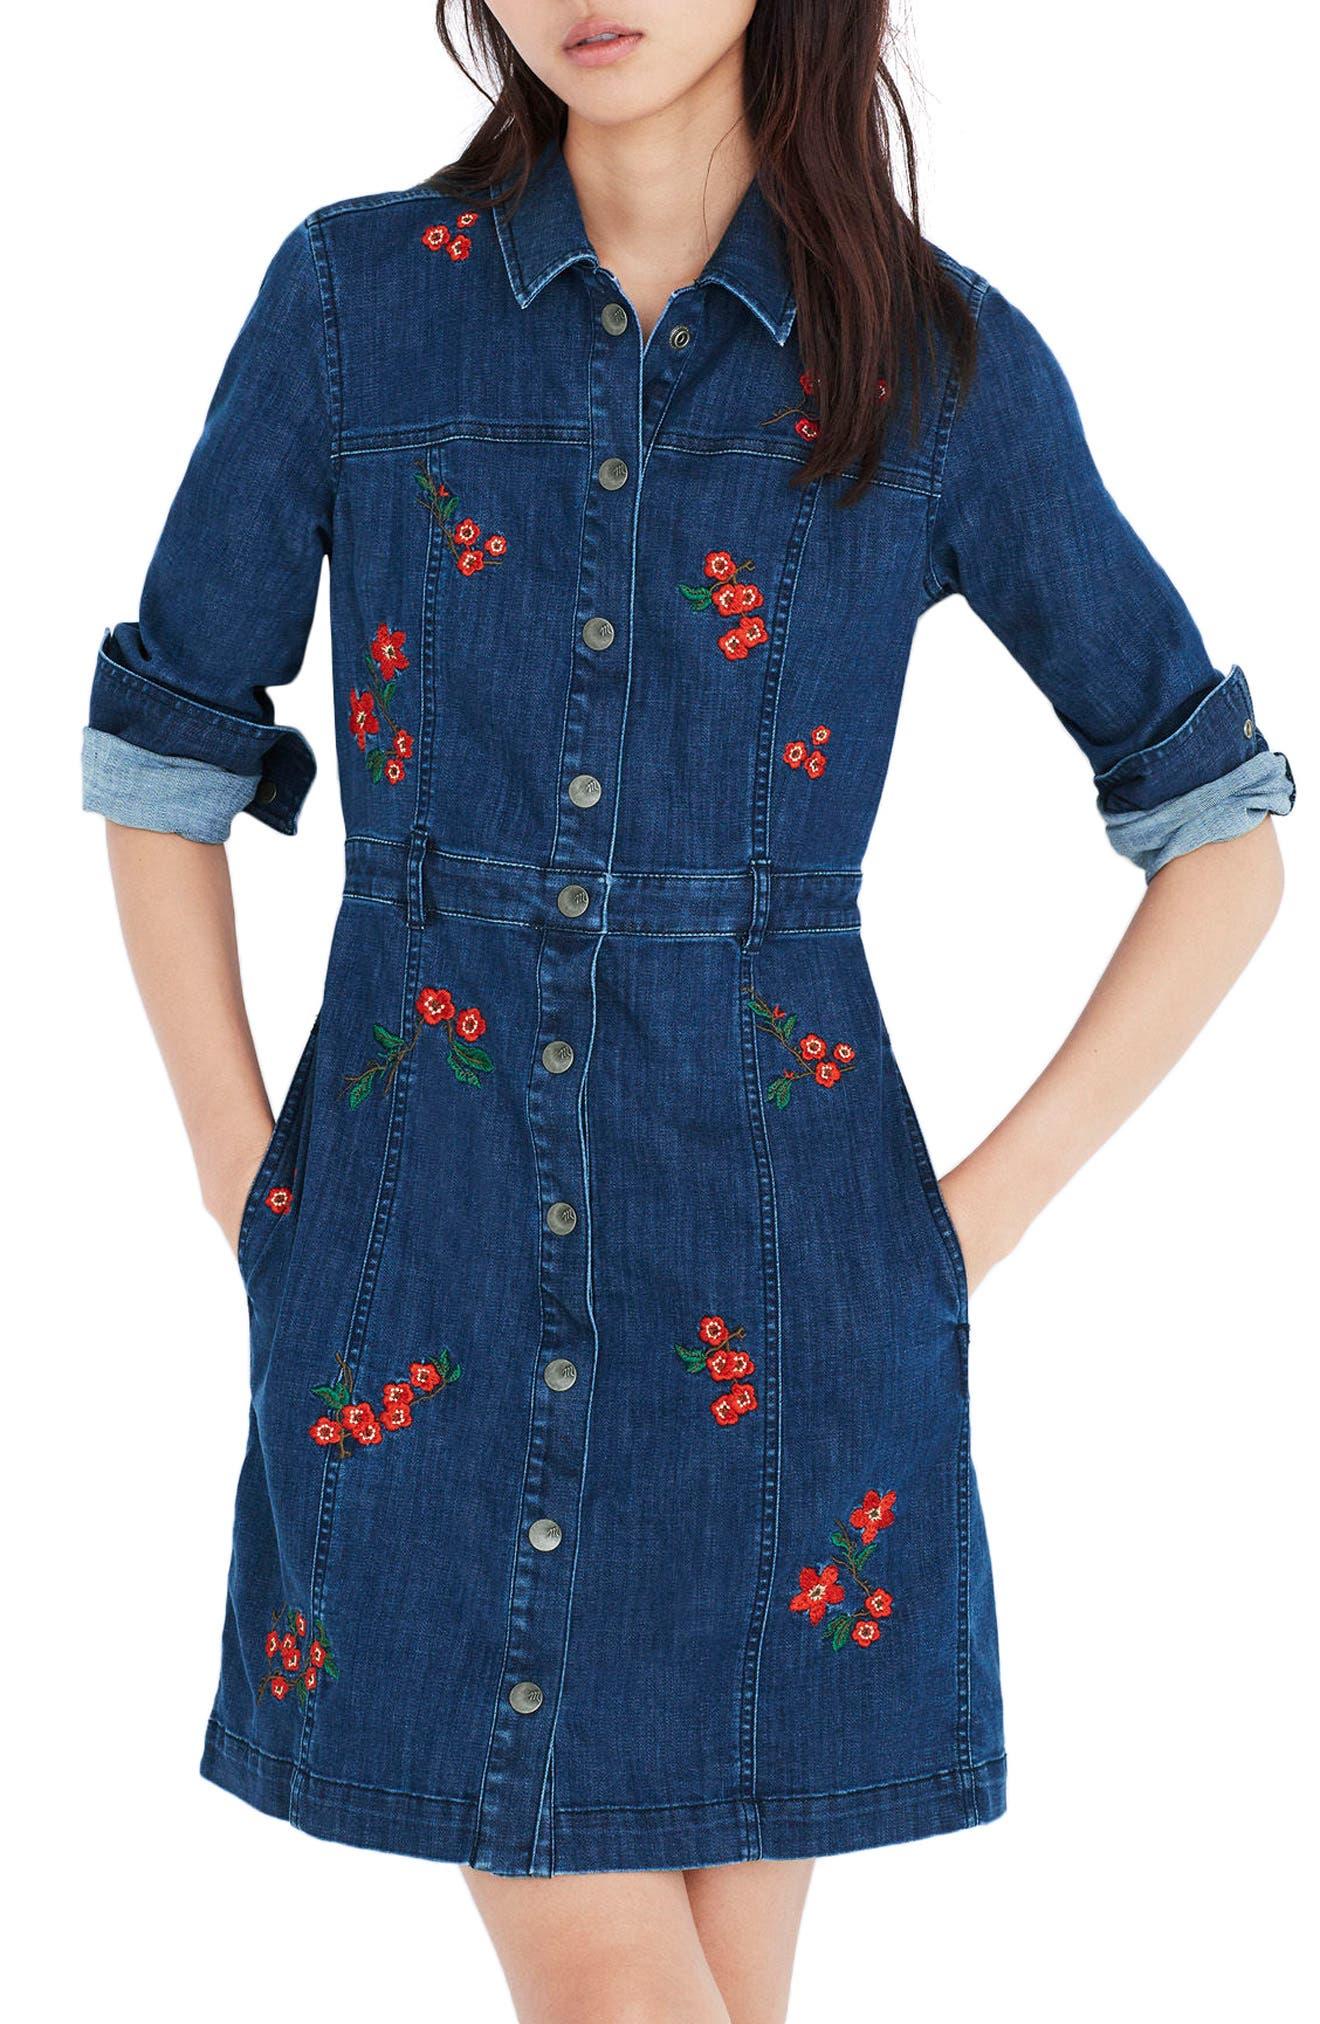 Madewell Embroidered Denim A-Line Dress